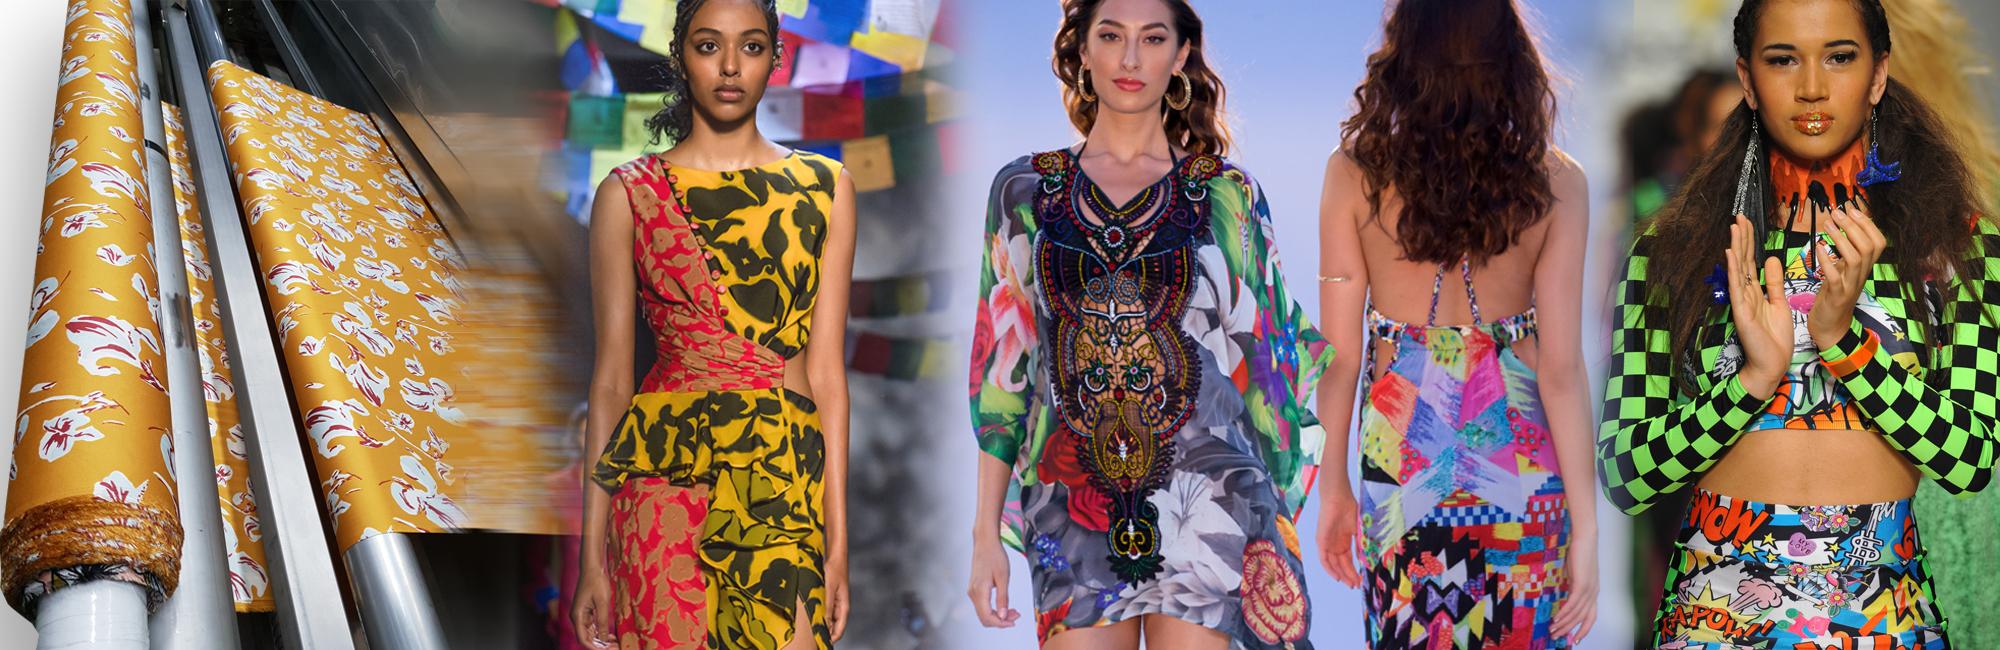 printed fabric for fashion